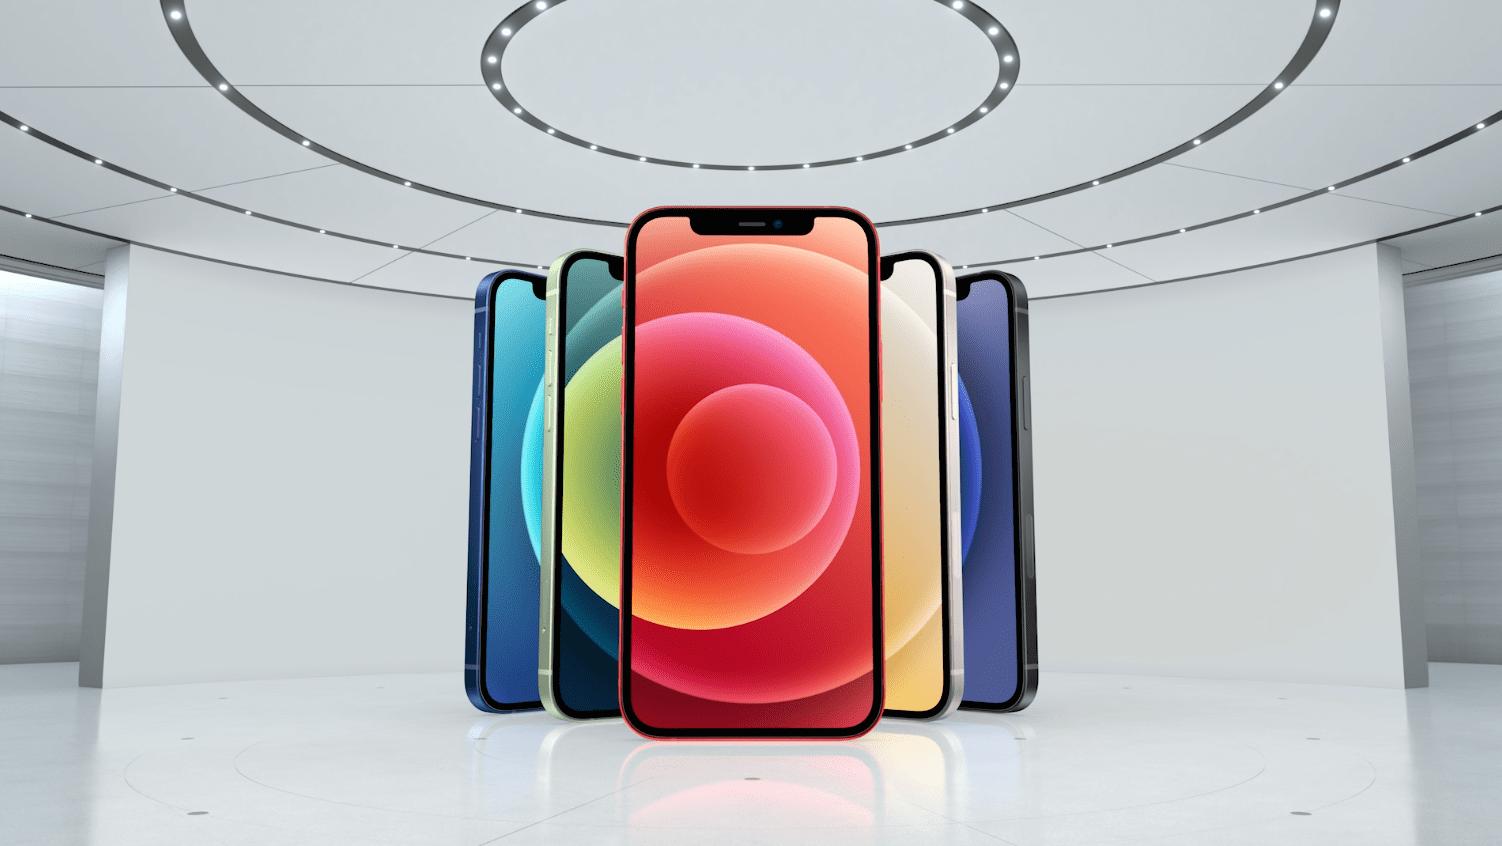 apple-iphone-12-premiera-7-1.png